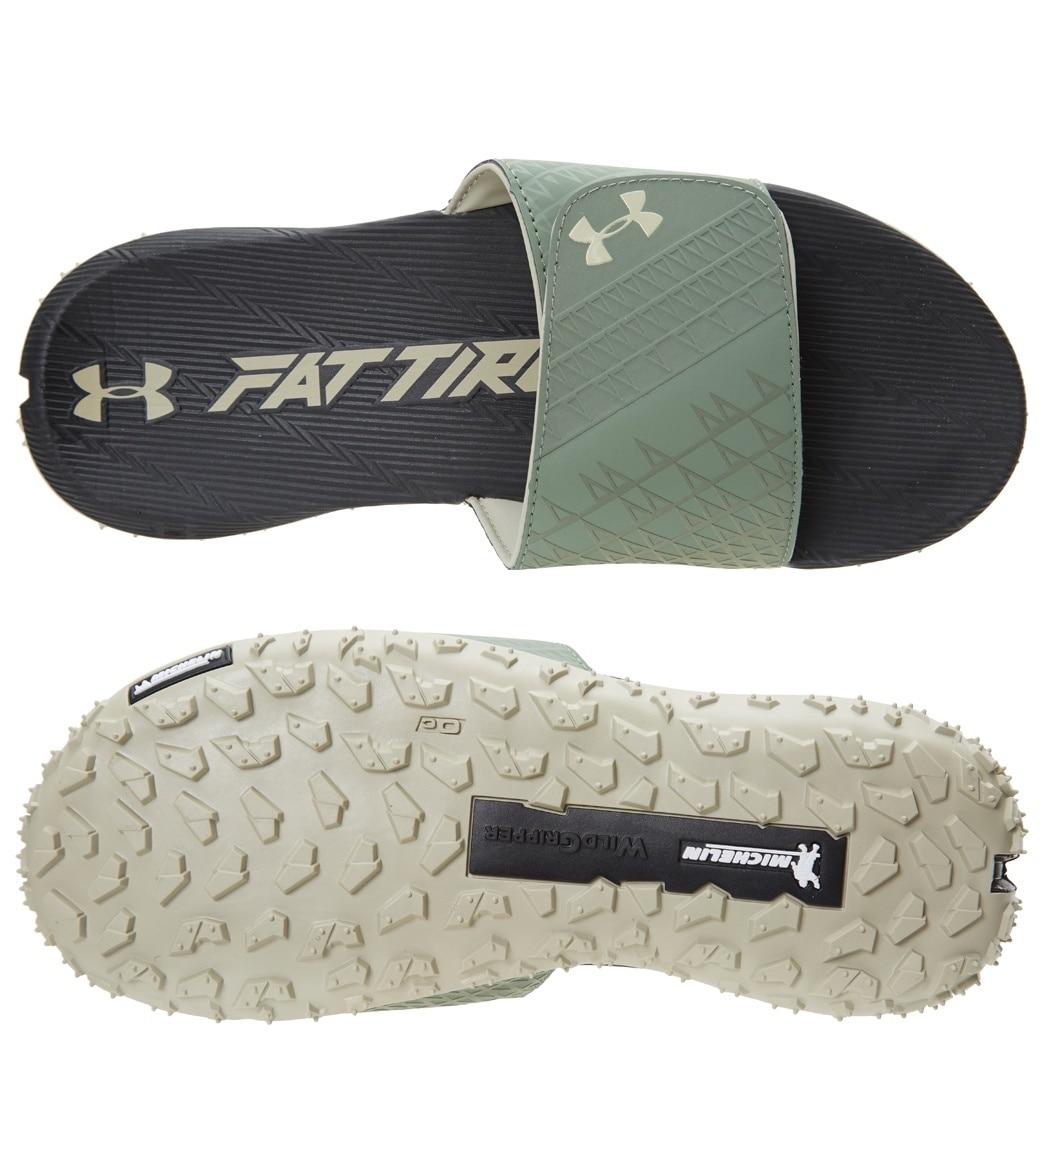 4b97bb252c Under Armour Men's Fat Tire Slide Sandal